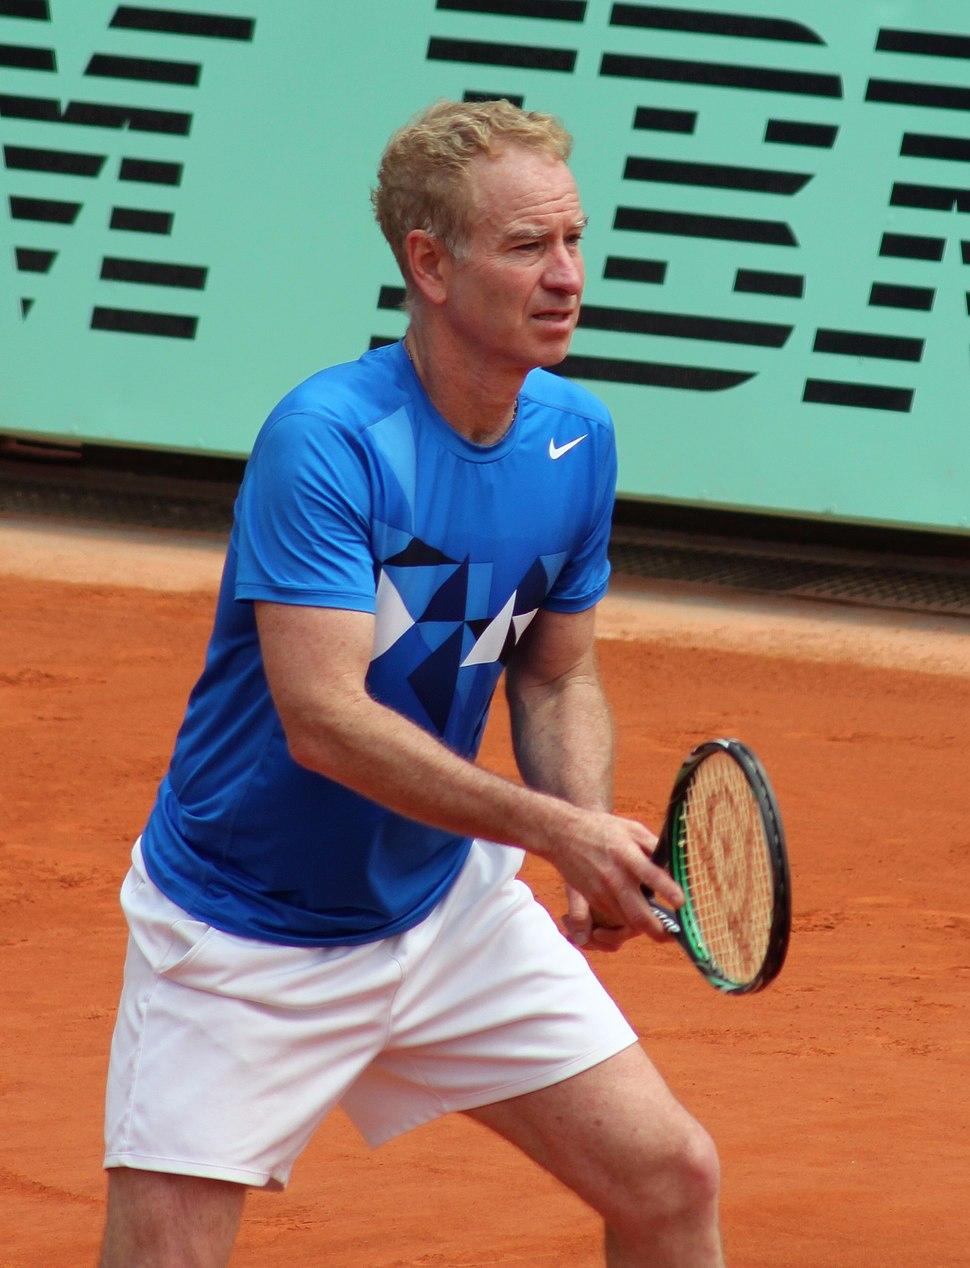 John McEnroe Roland Garros 2012